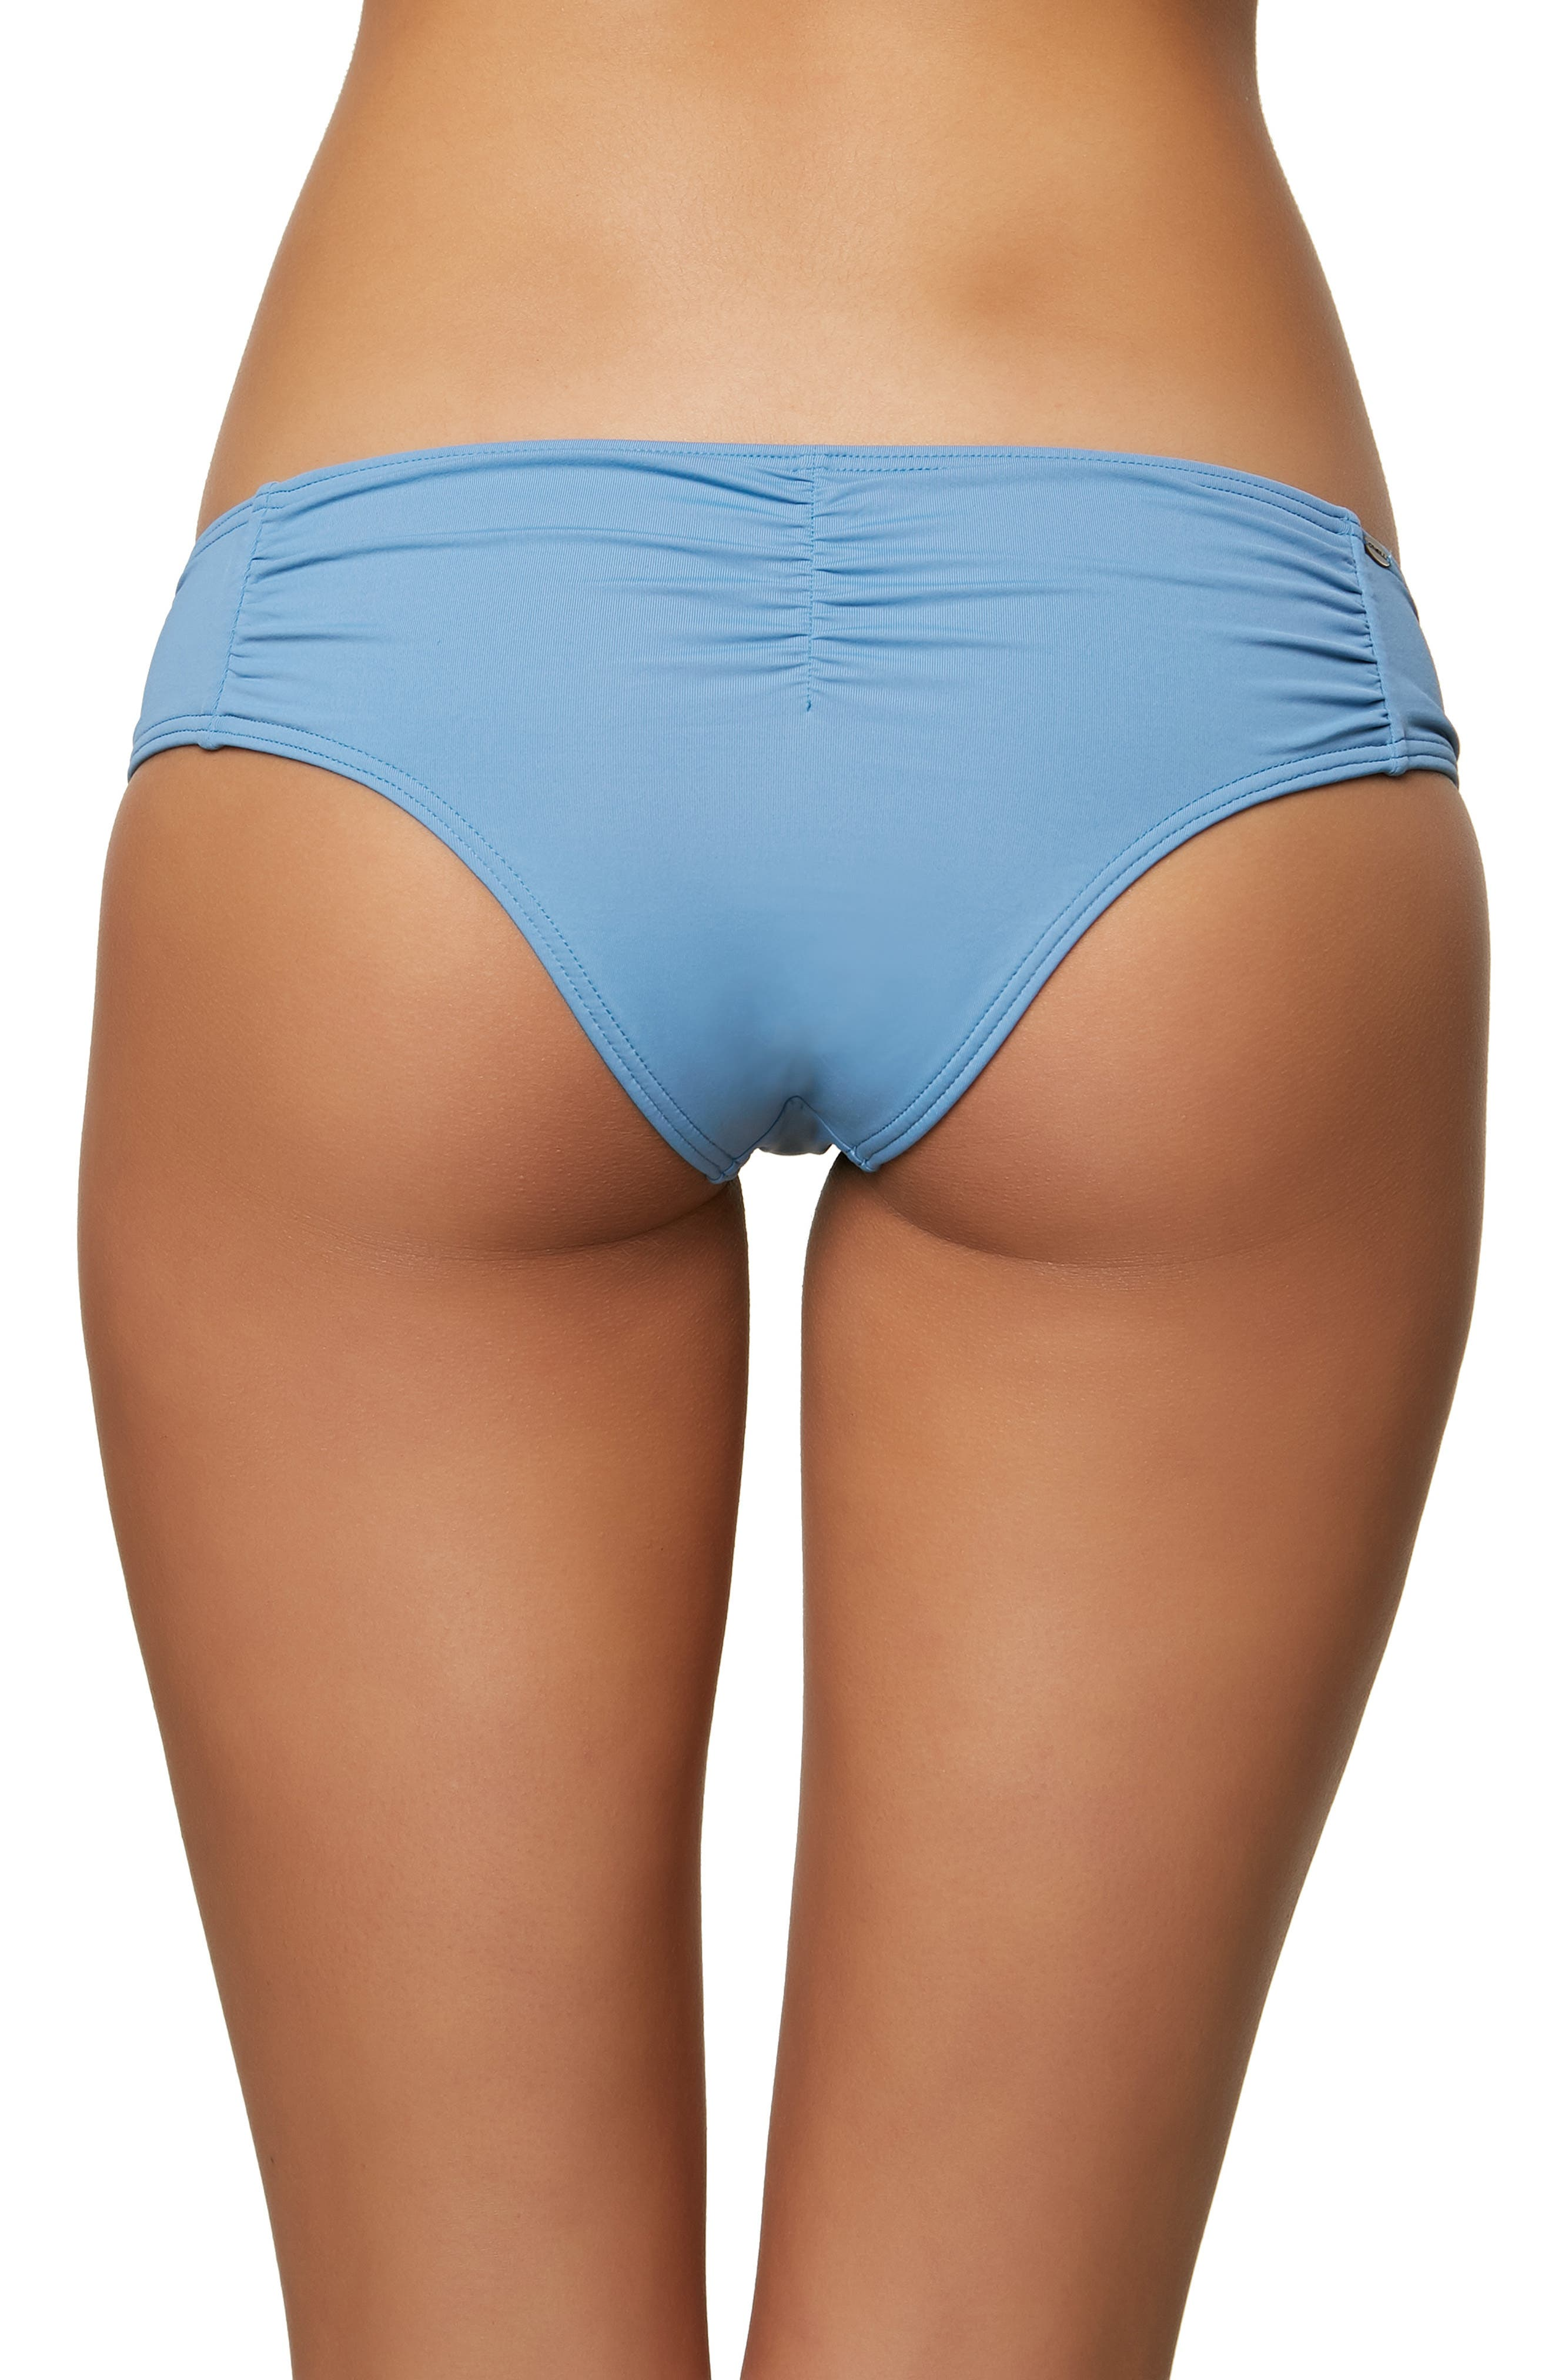 Salt Water Solids Hipster Bikini Bottoms,                             Alternate thumbnail 2, color,                             WASHED INDIGO